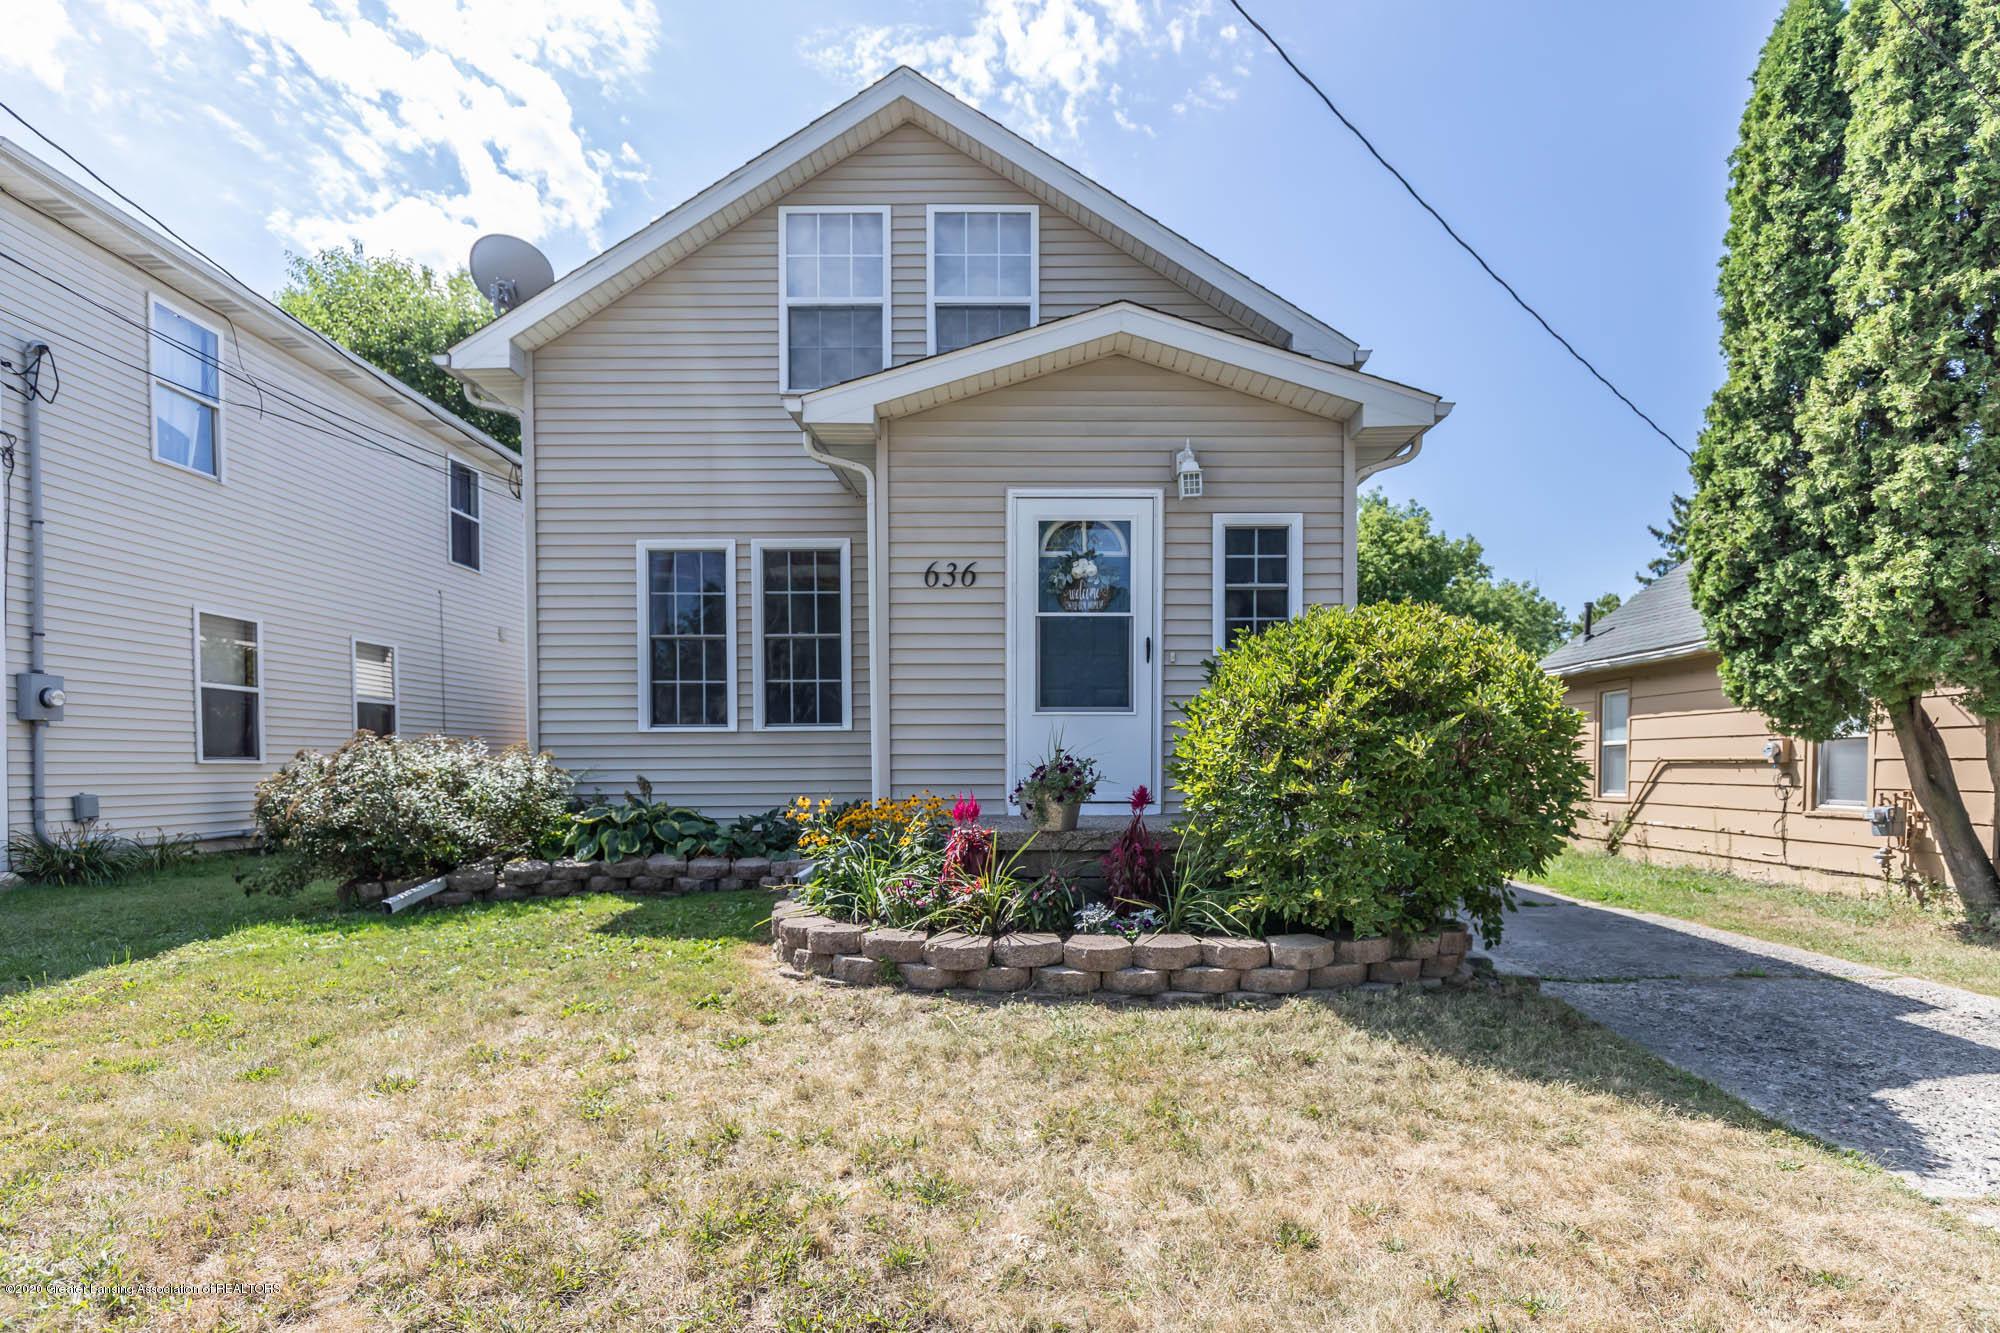 636 E Cavanaugh Rd - cavfront (1 of 1) - 1